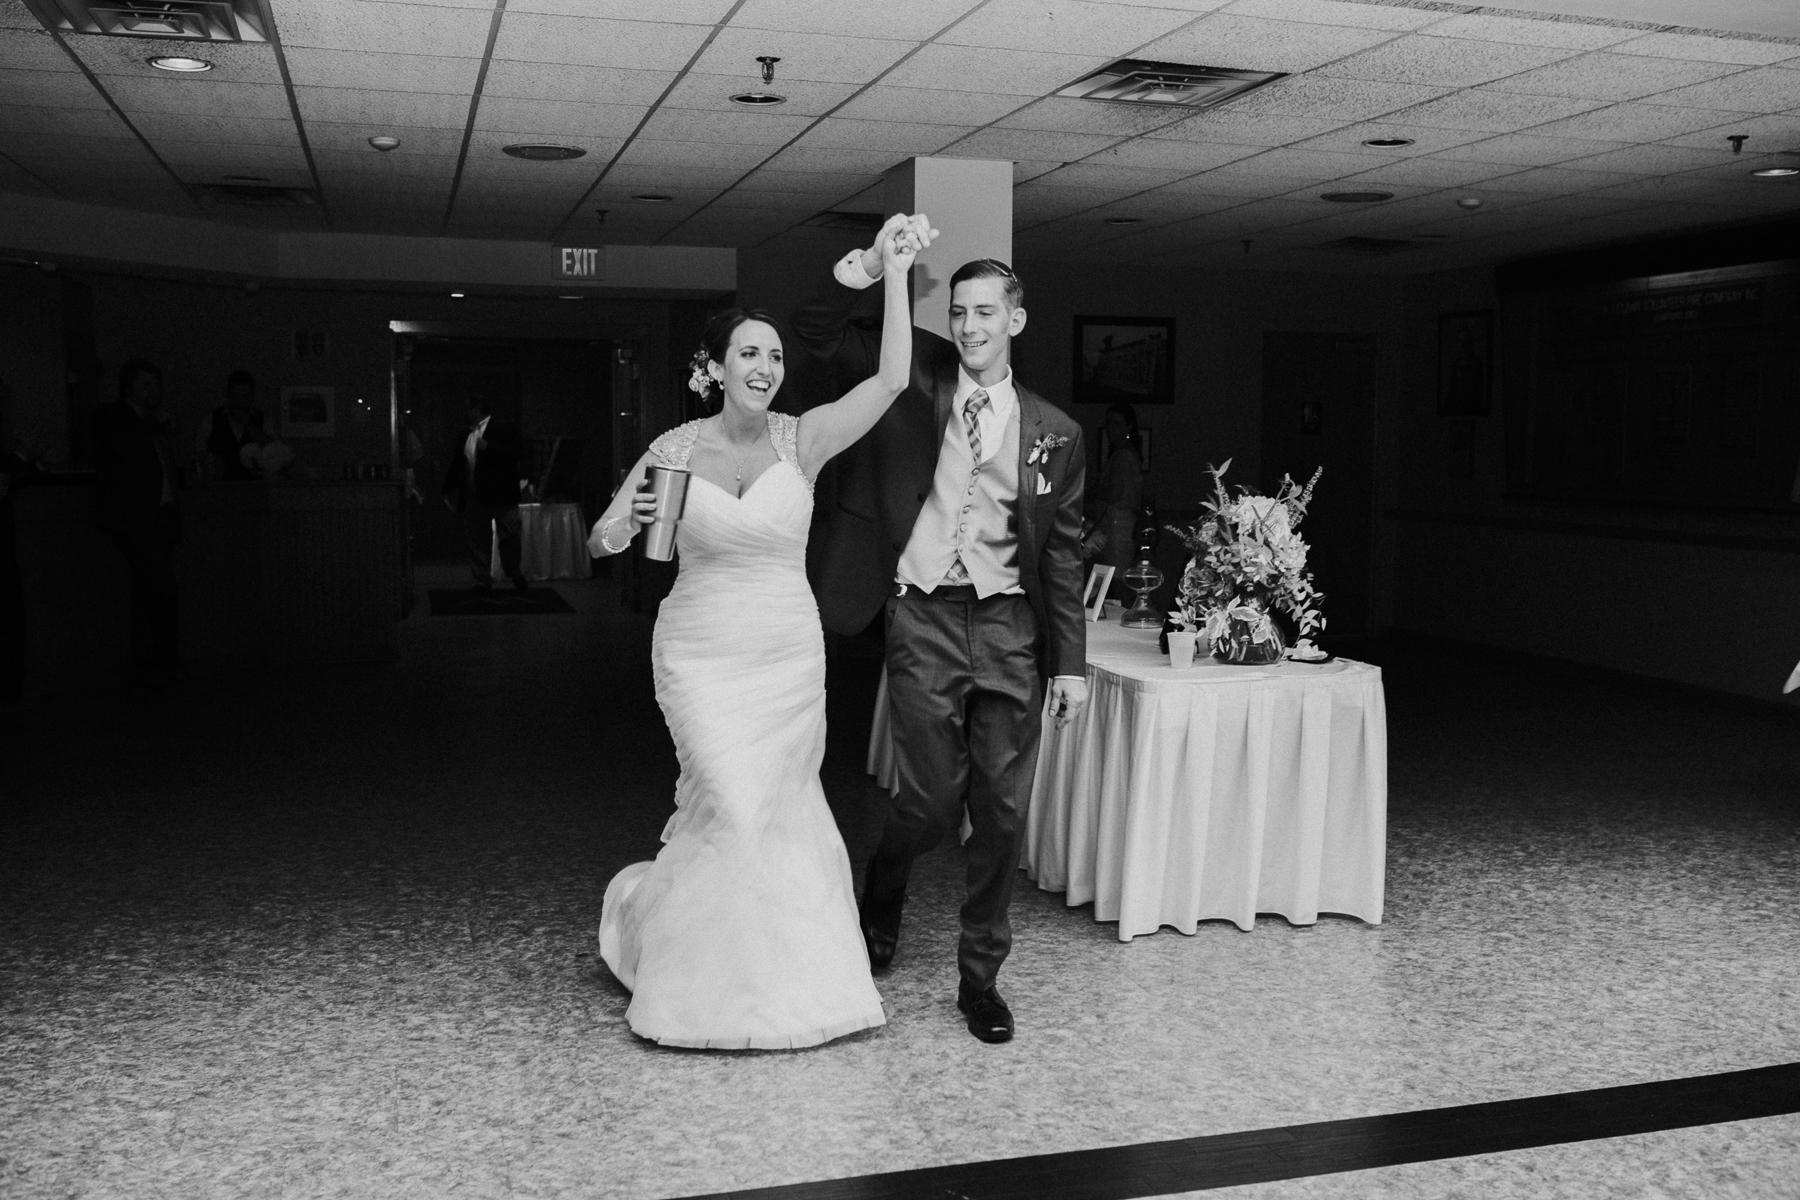 buffalo-new-york-wedding-photography-1-2.jpg